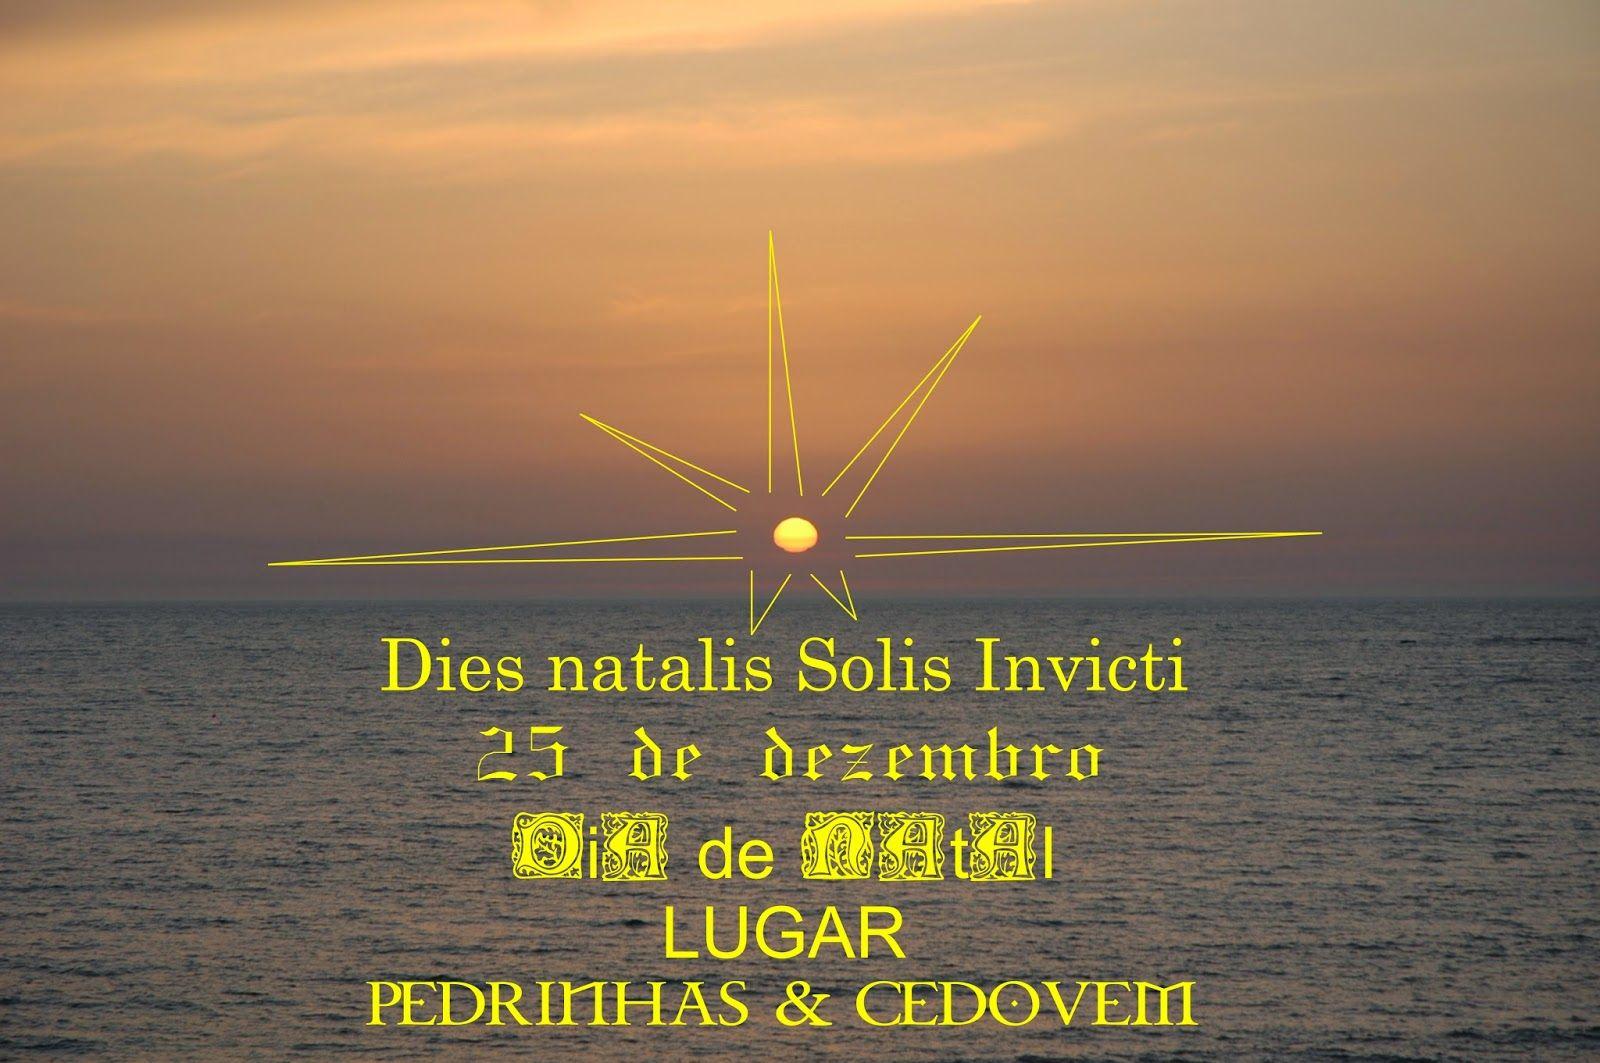 PEDRINHAS & CEDOVÉM - Apúlia - Esposende - PORTUGAL - - - - - - - - - EUROPE - - - - - - - - -: Dies natalis Solis Invicti - Dia de Natal - Aniver...